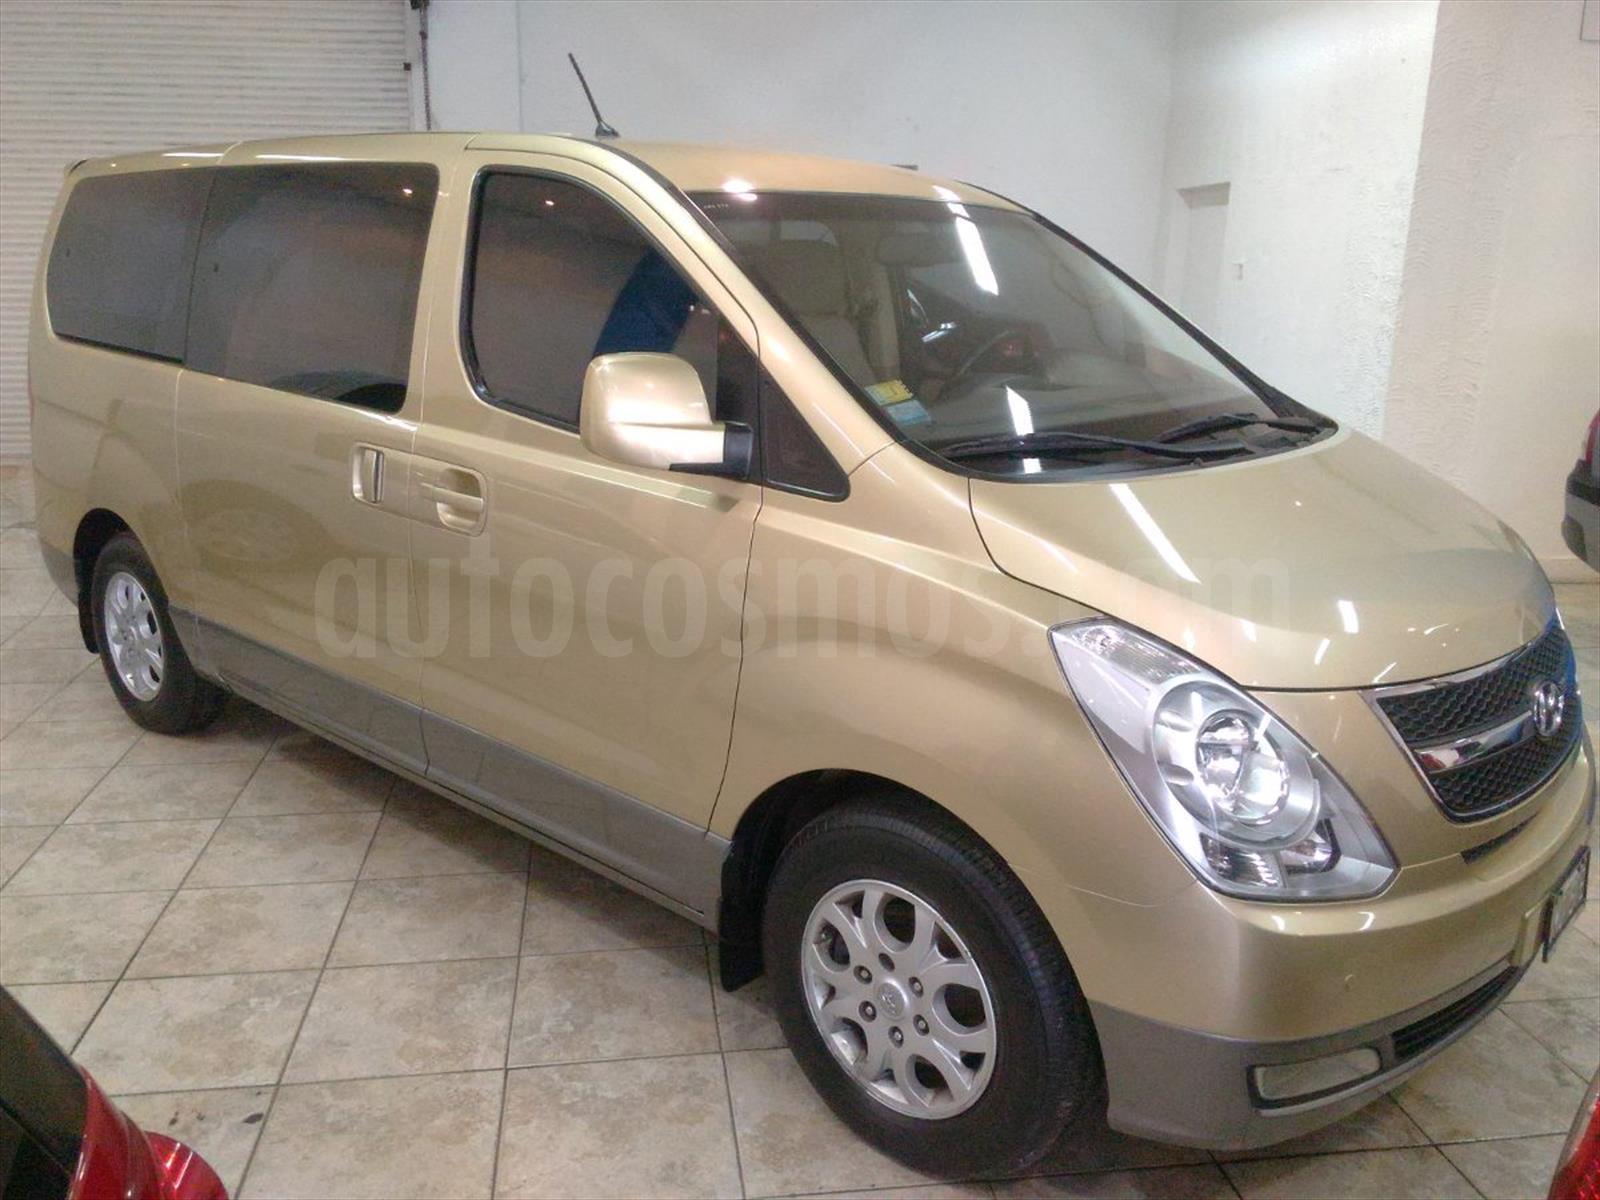 venta autos usado buenos aires gba hyundai  van vidriada  pasajeros